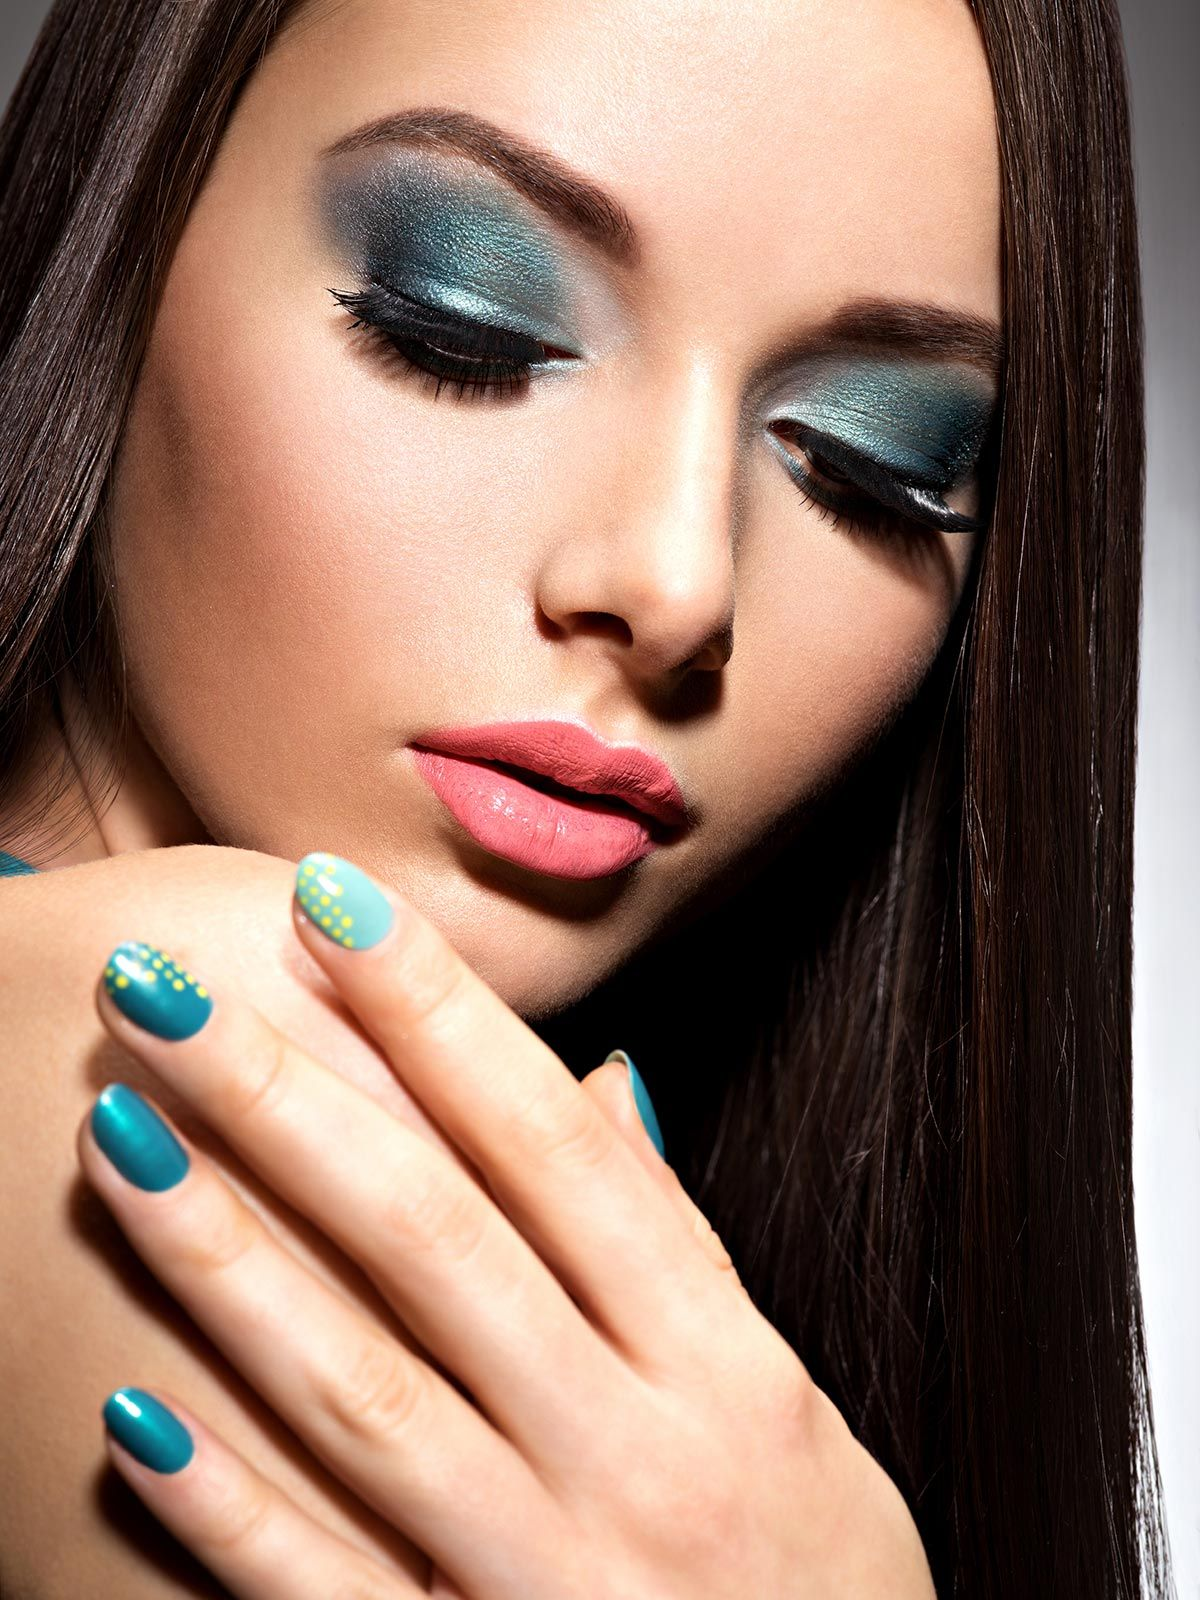 maquillaje ojos manicura azul